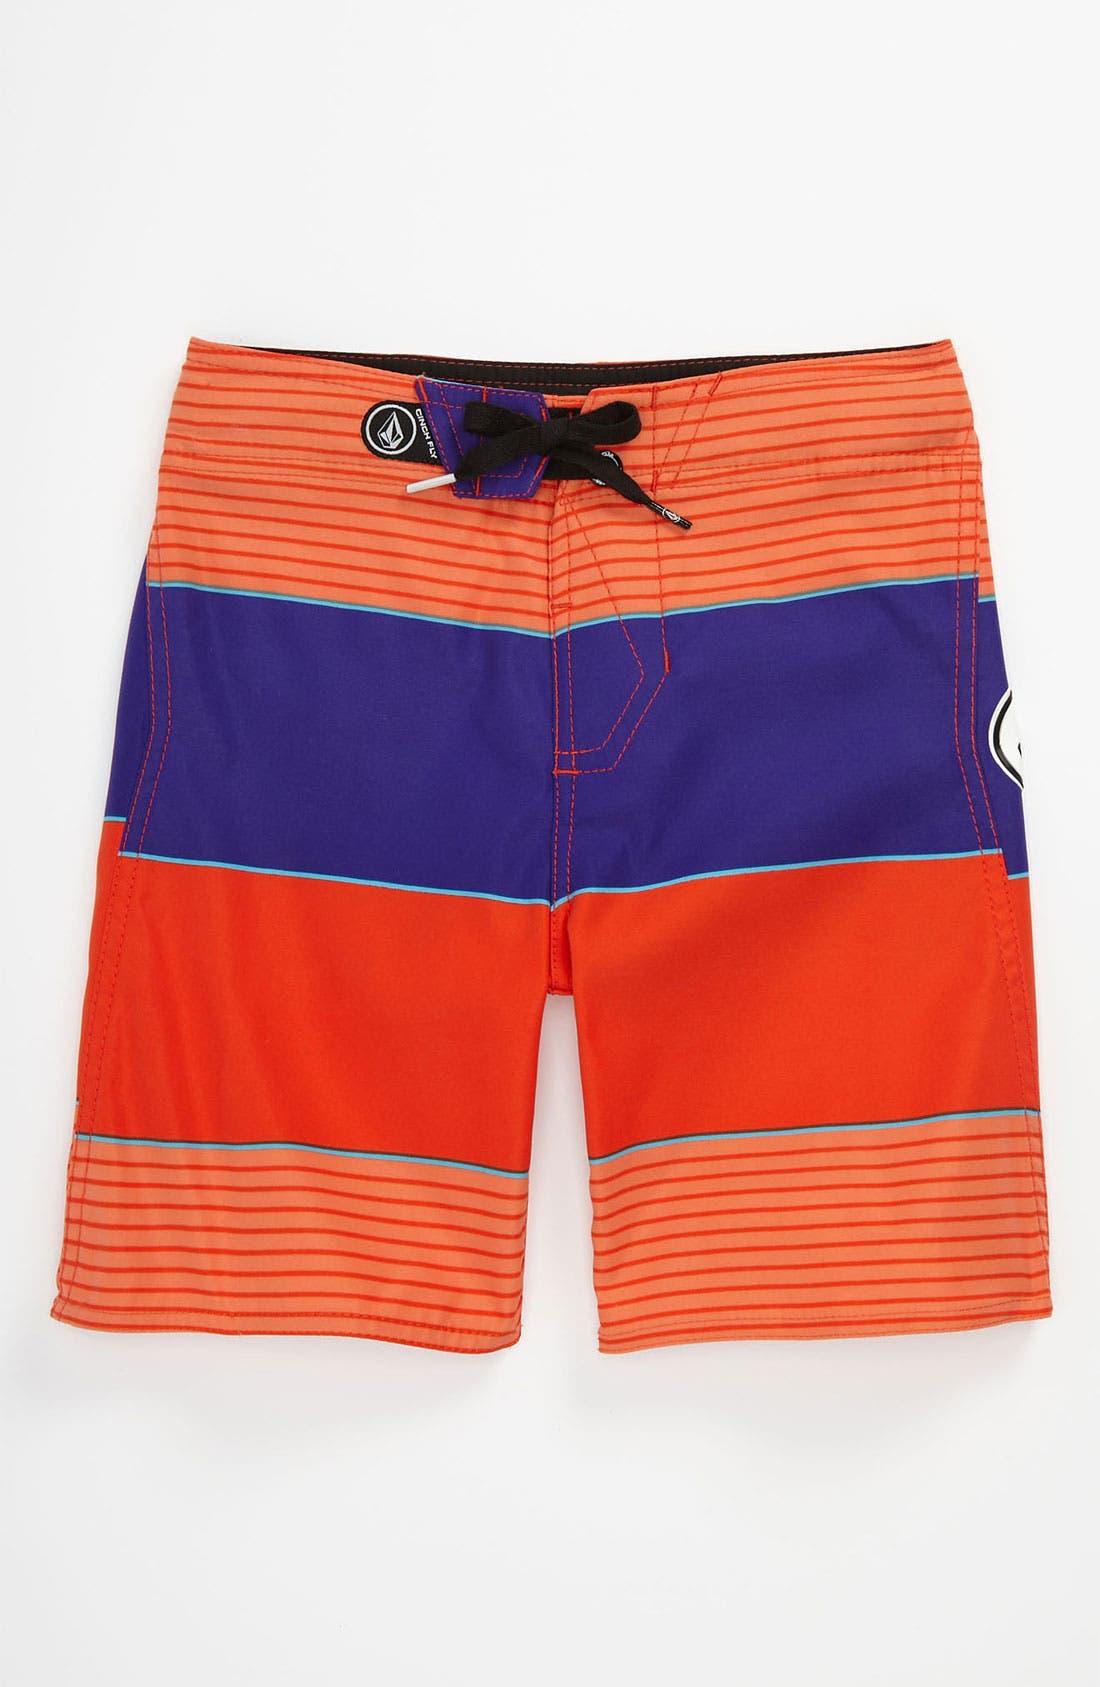 Alternate Image 1 Selected - Volcom 'Maguro' Stripe Board Shorts (Big Boys)